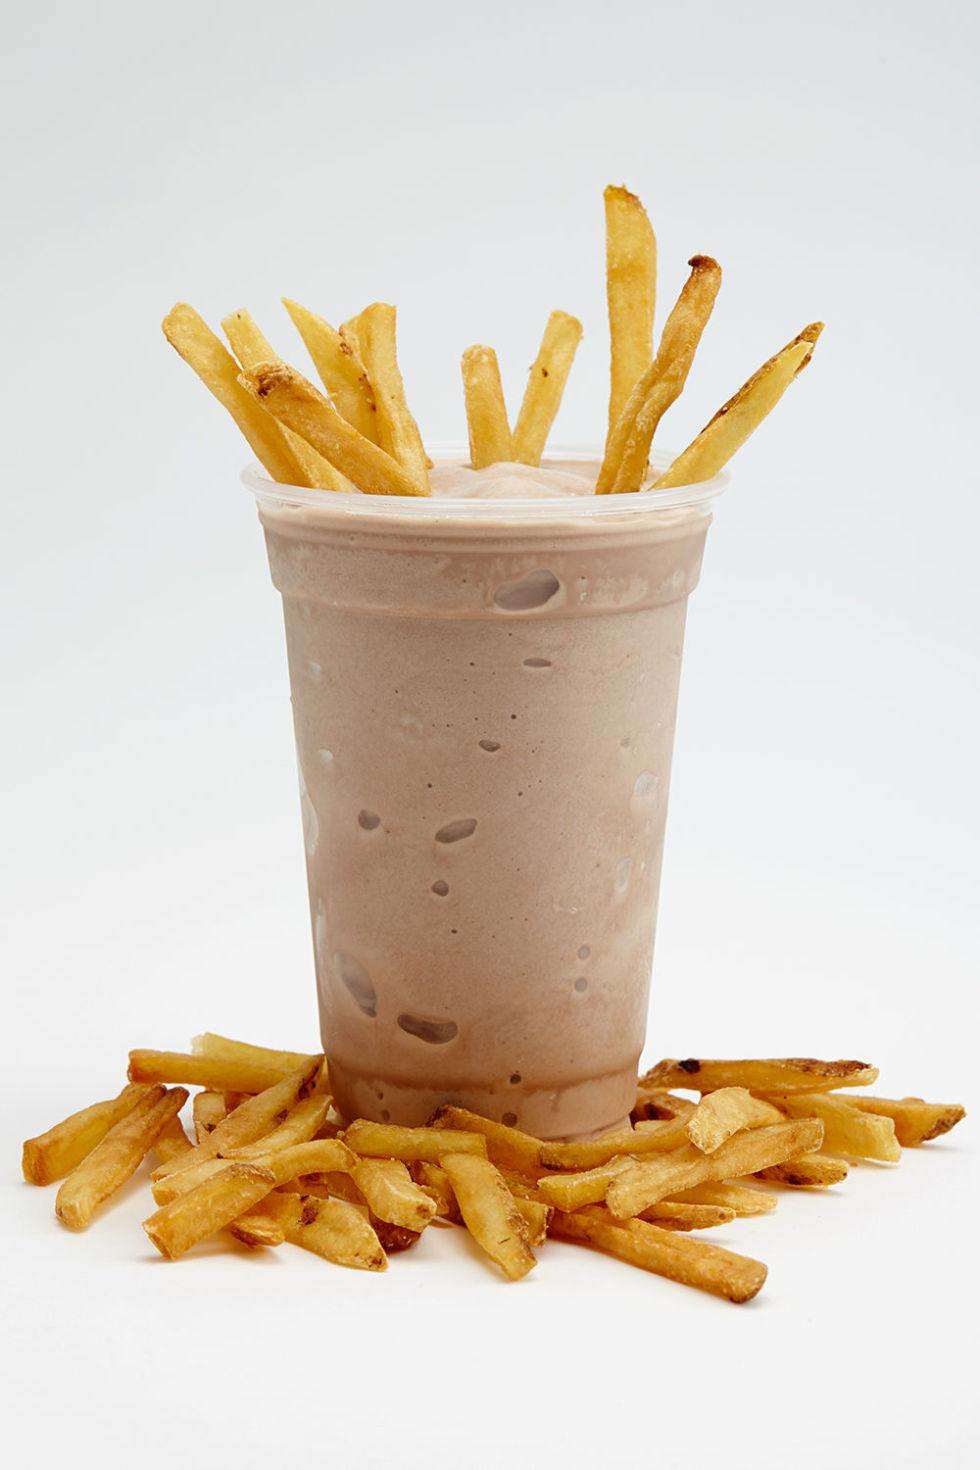 Afbeeldingsresultaat voor milkshake and fries